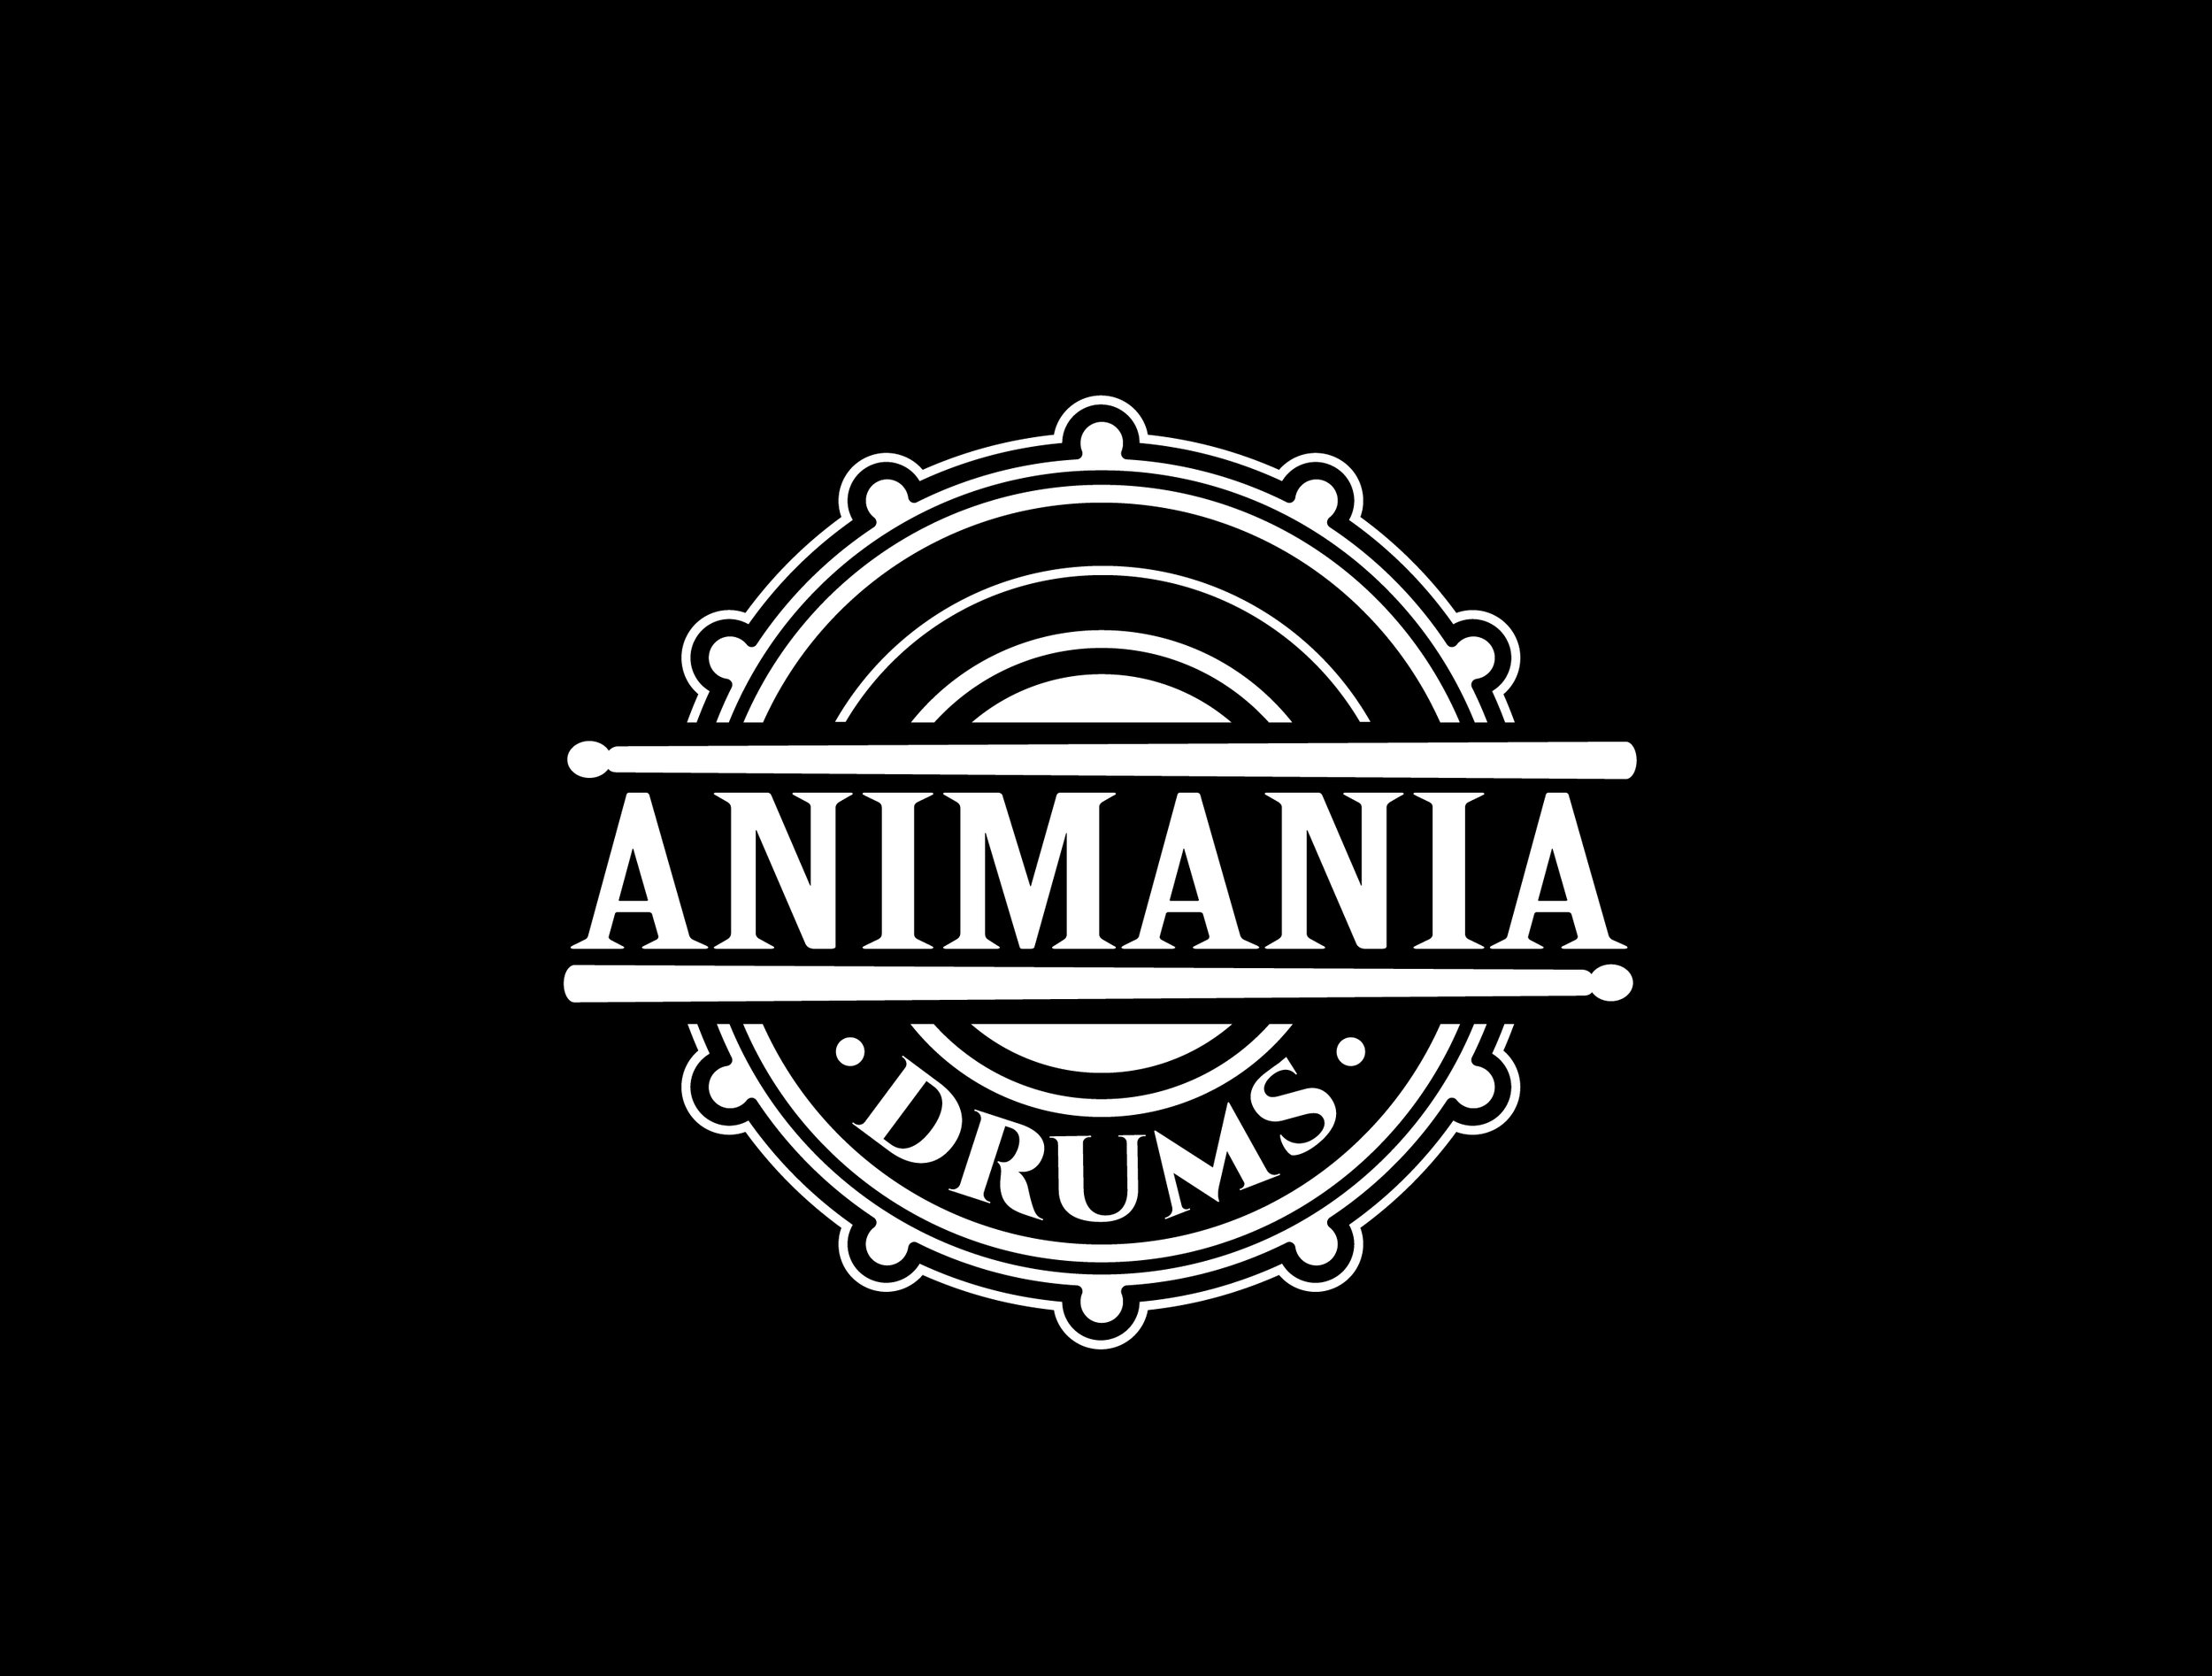 AnimaniaDrums_4_JPG.jpg